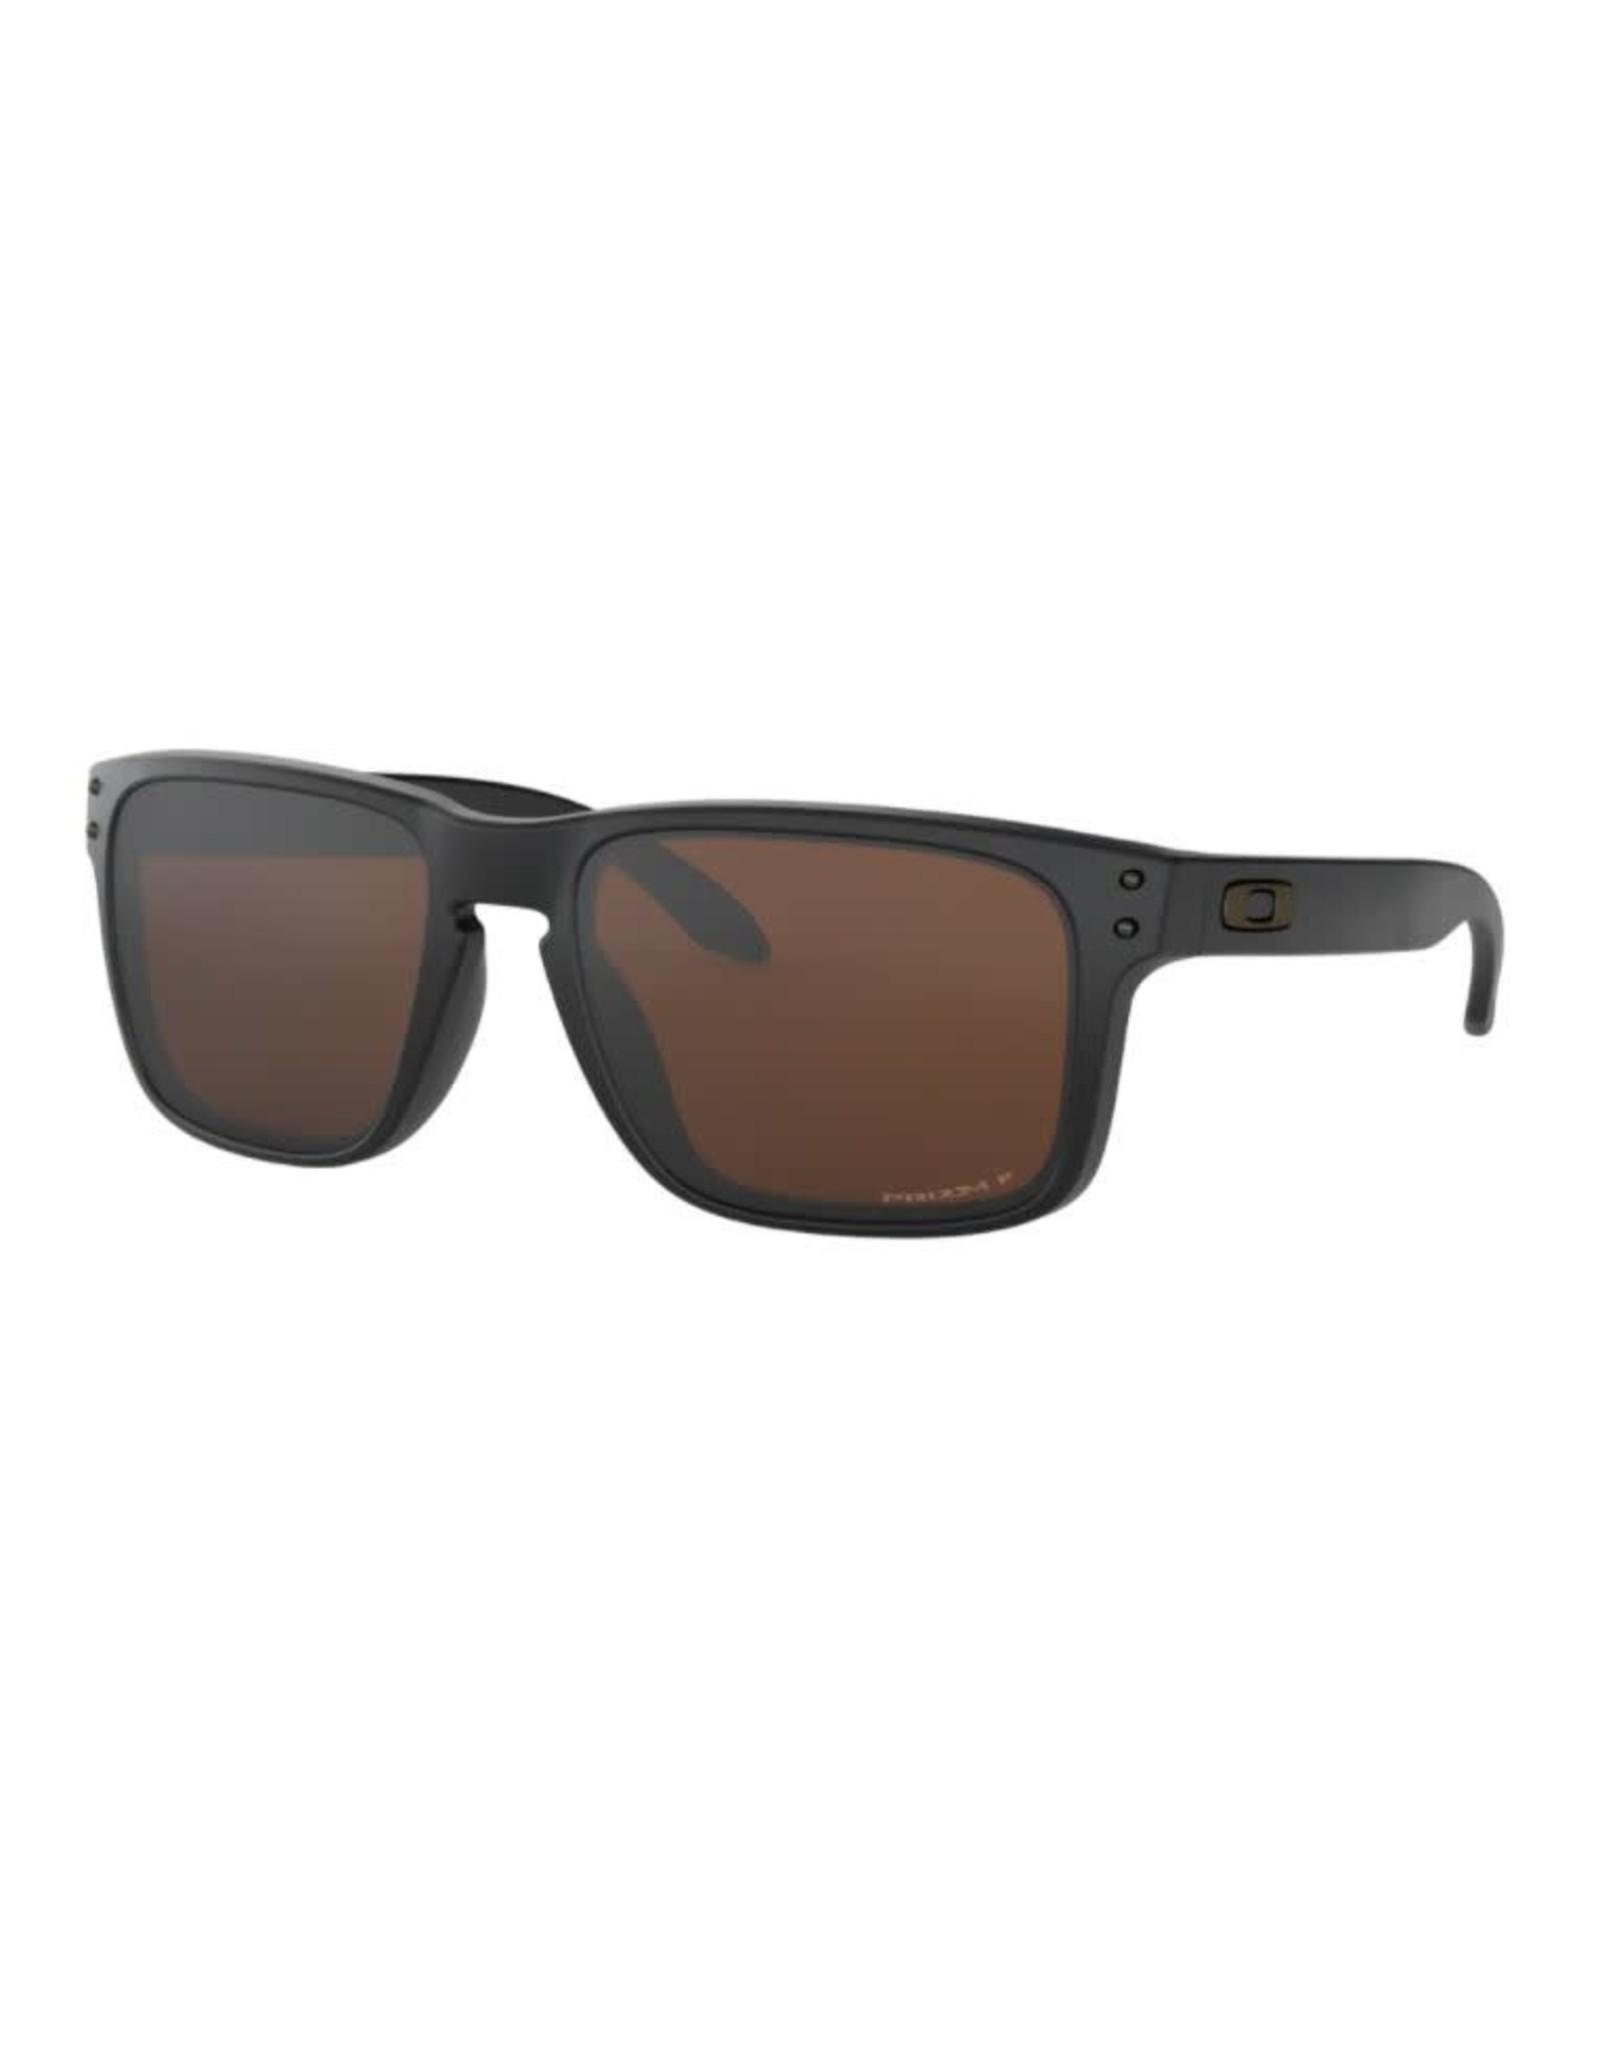 Oakley Oakley - Lunette soleil homme holbrook matte black/lens prizm tungsten polarized